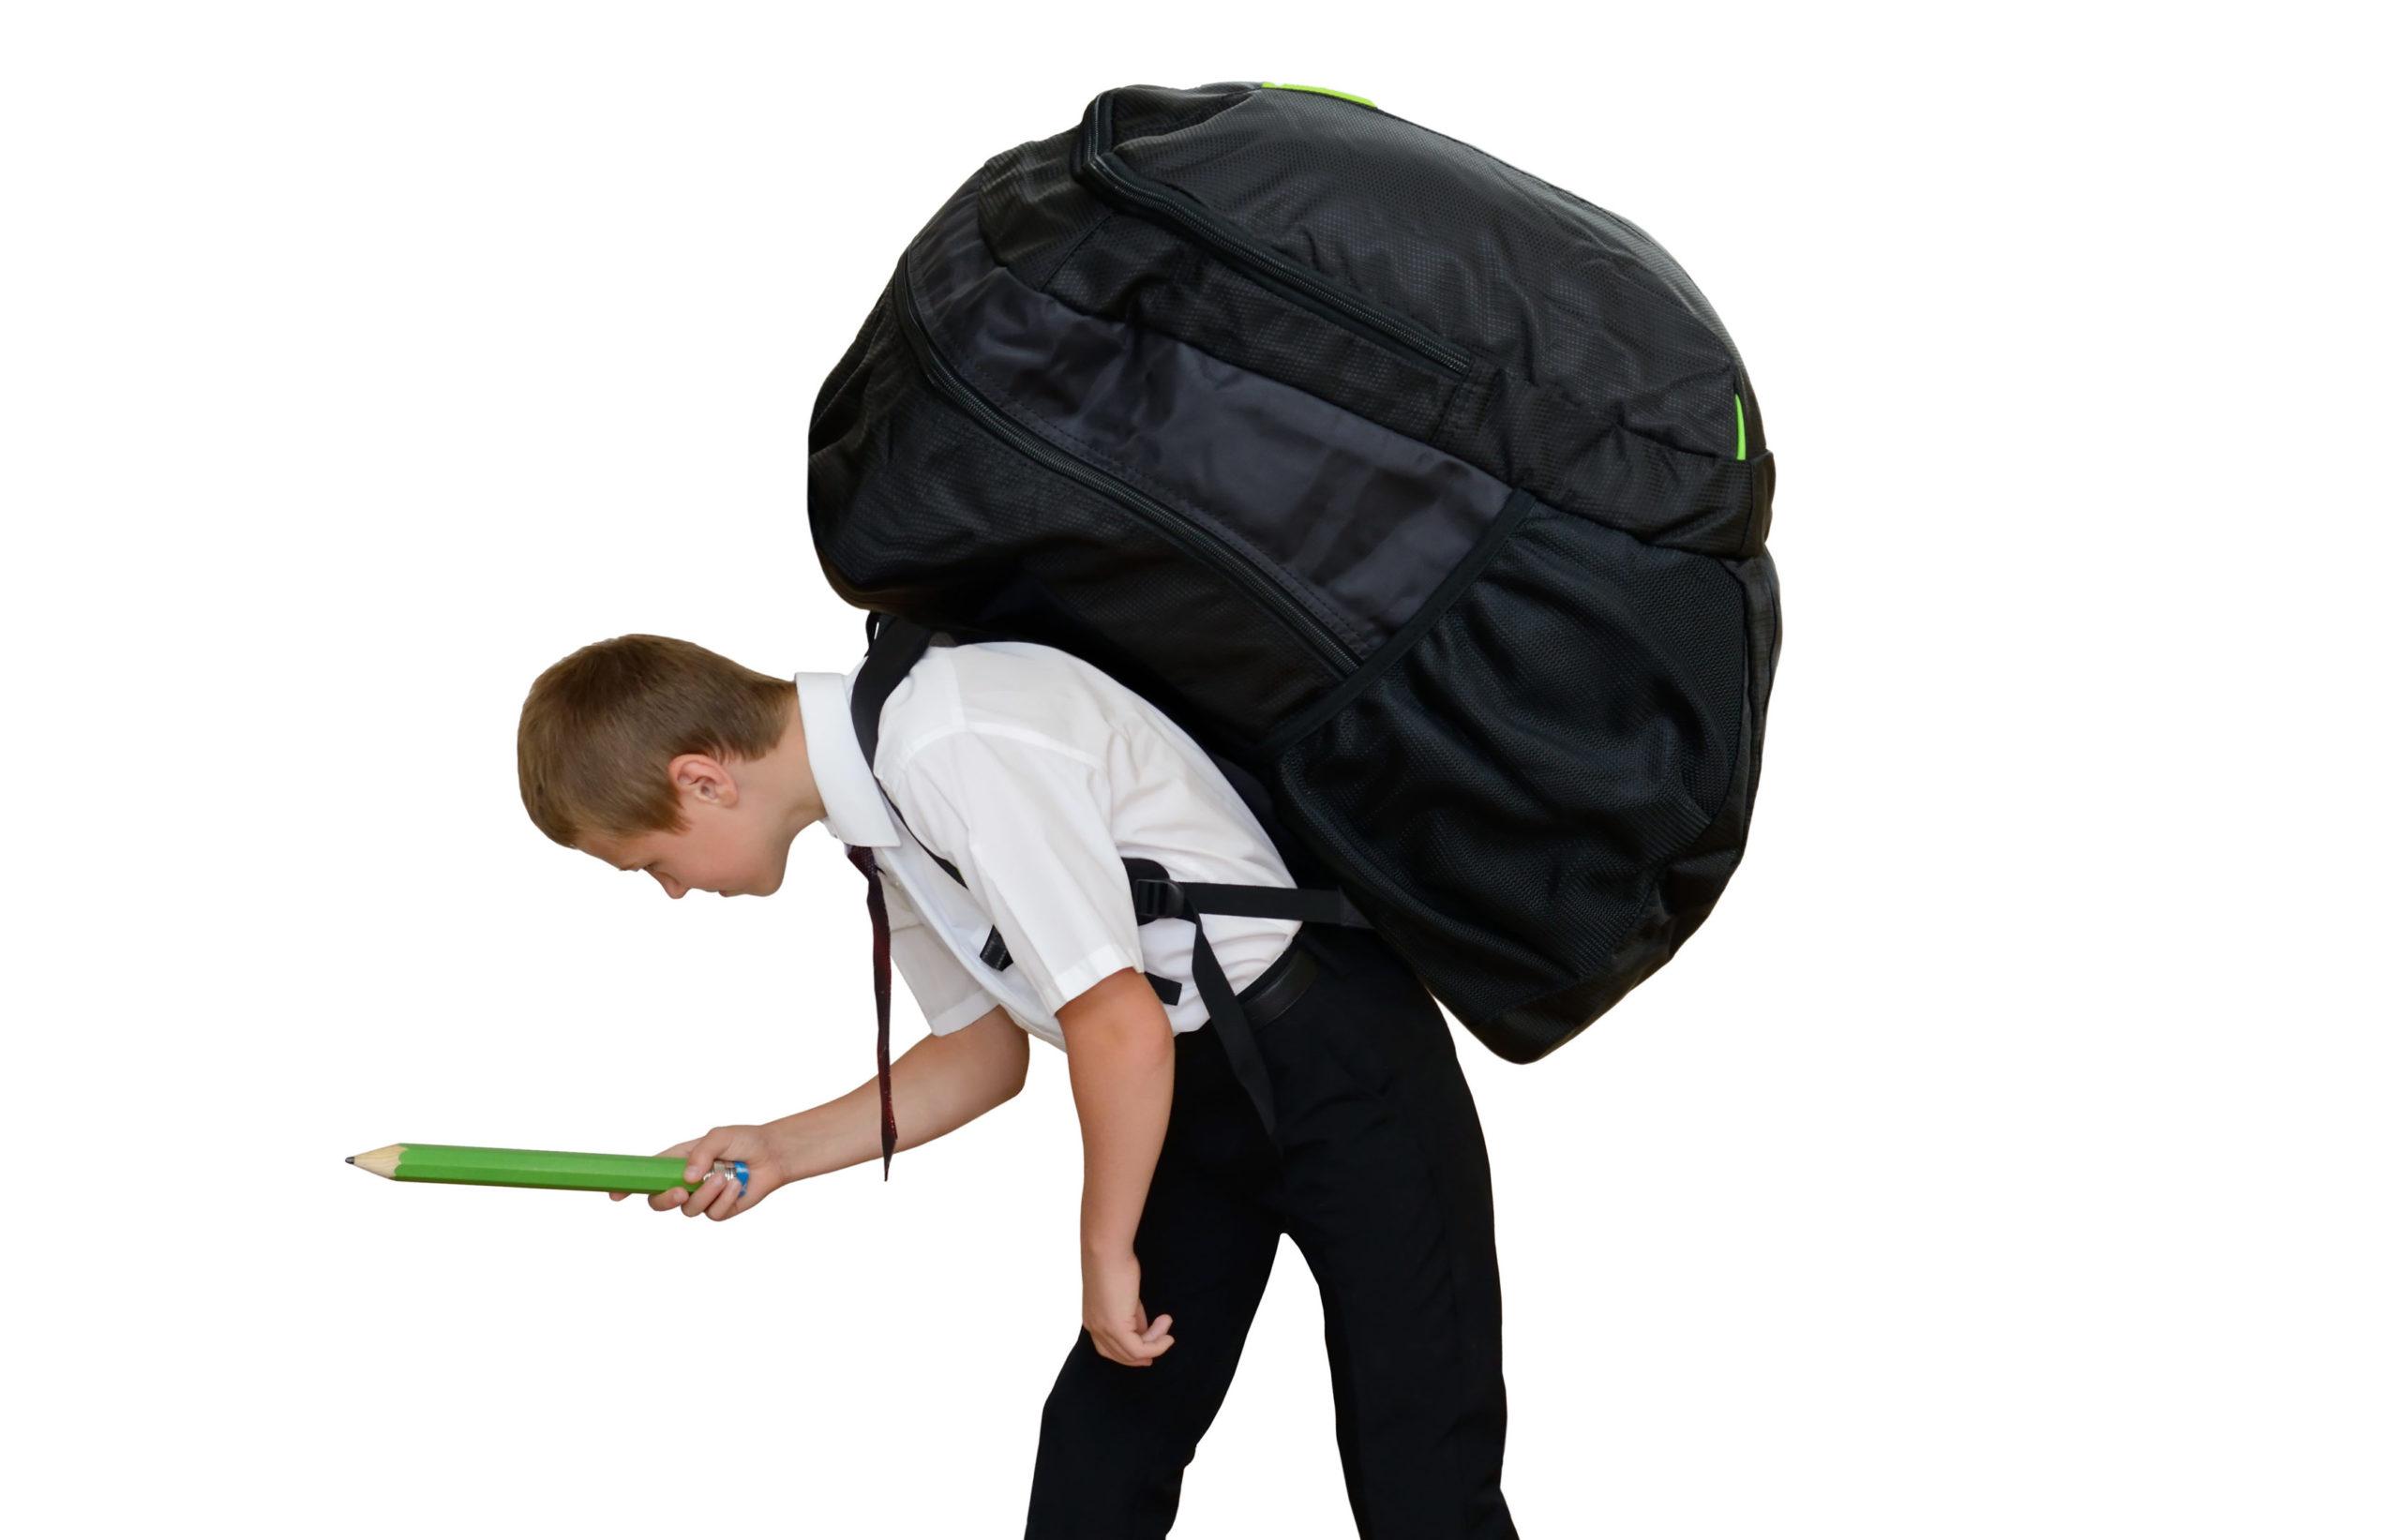 mochila pesada